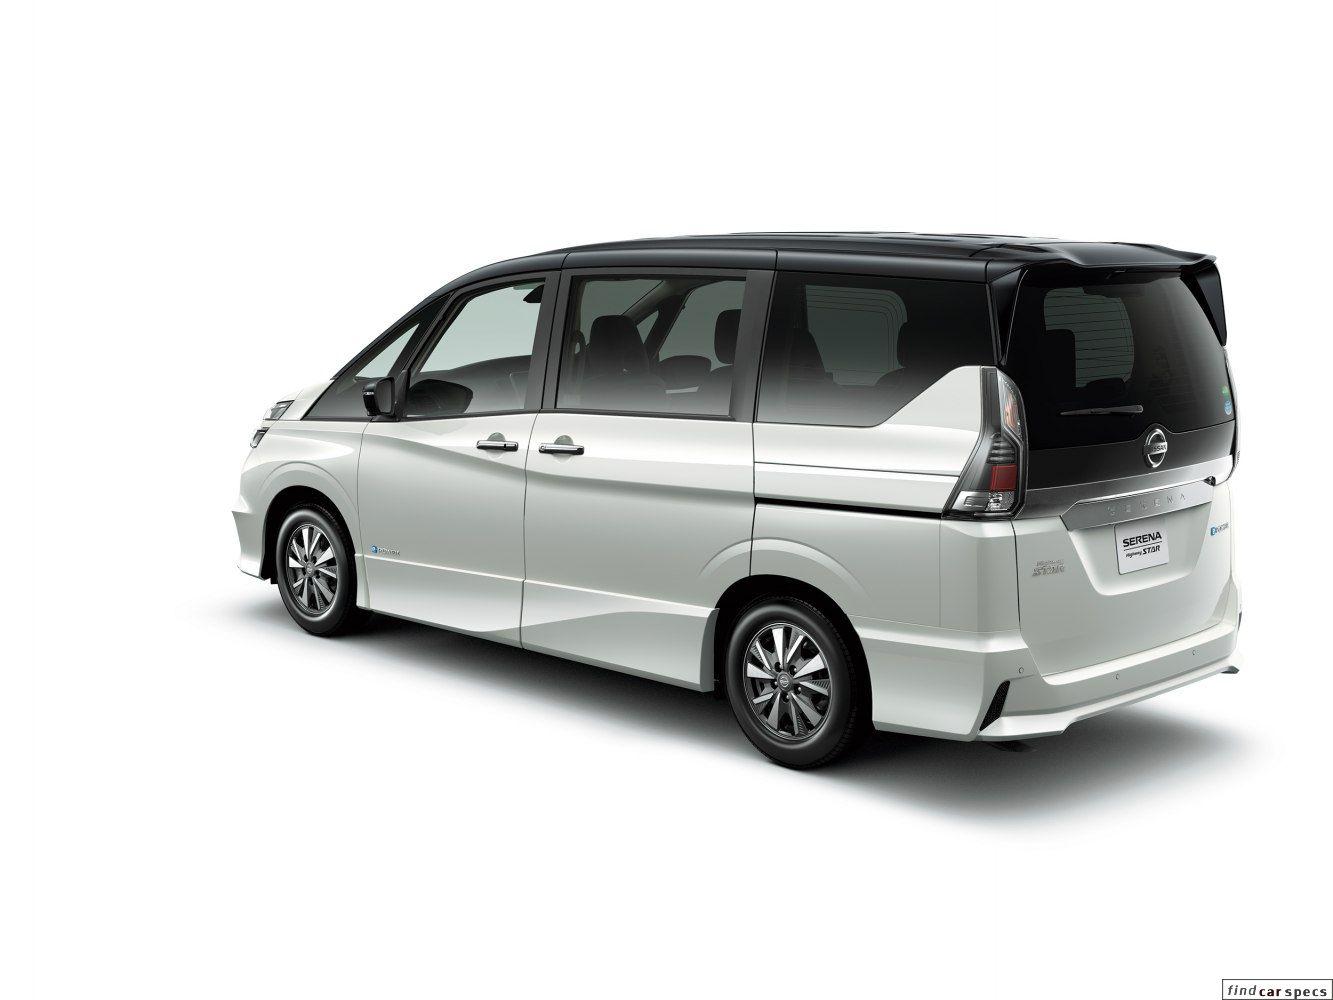 Nissan Serena Serena C27 2 0 150 Hp S Hybrid Cvt Petrol Electricity 2016 Serena C27 2 0 150 Hp S Hybr In 2020 Nissan Fuel Economy Mini Van